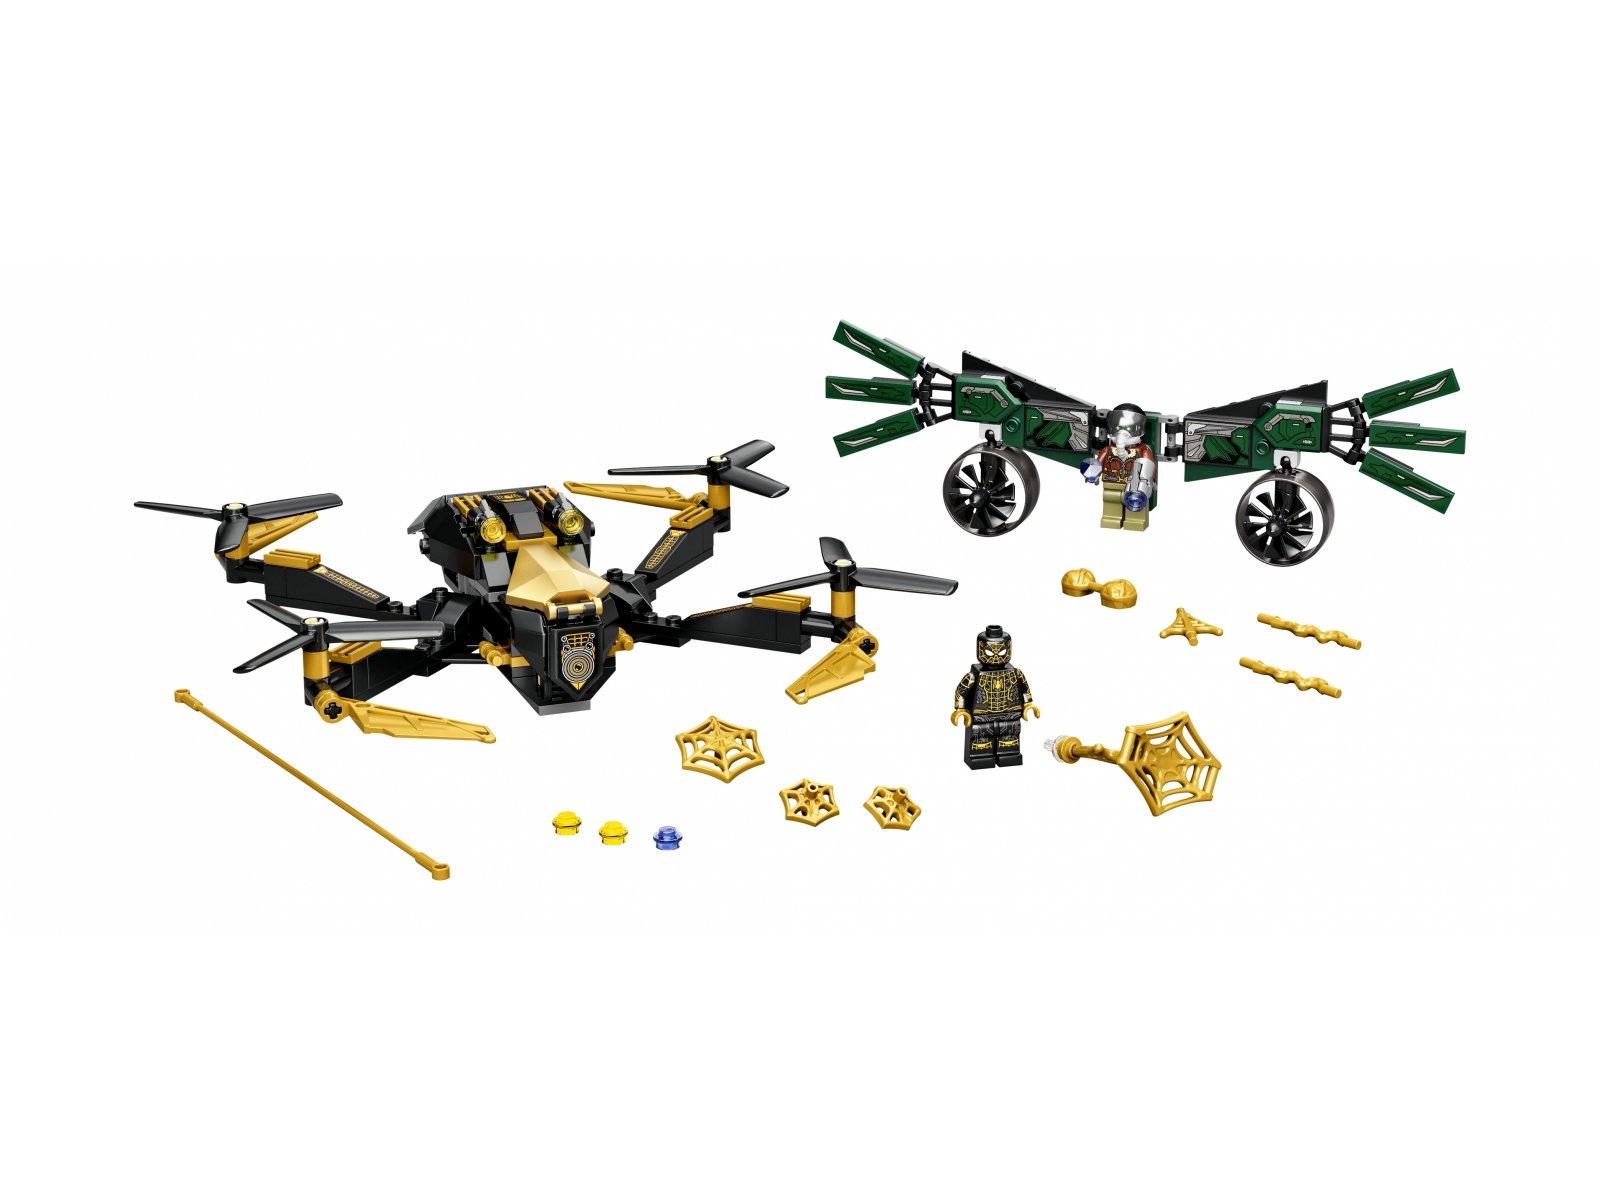 LEGO 76195 Bojowy dron Spider-Mana